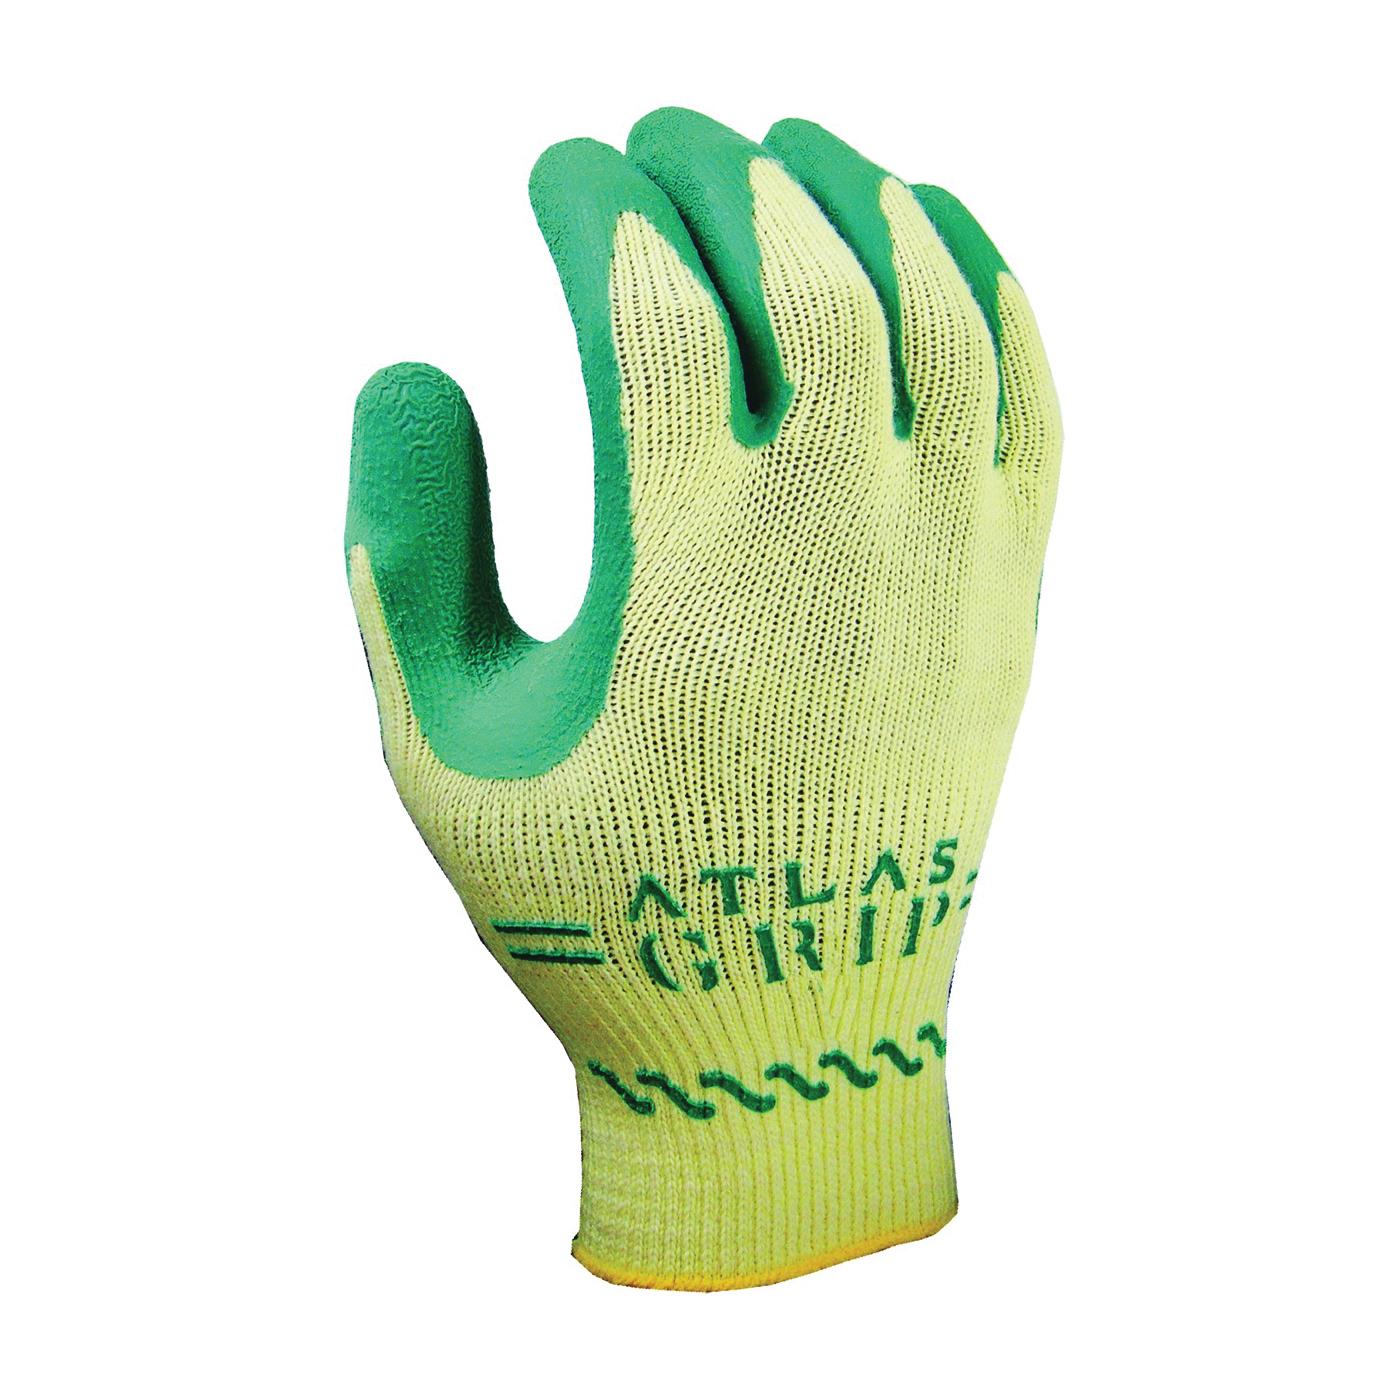 Picture of ATLAS 310GXS-06.RT Ergonomic Protective Gloves, XS, Knit Wrist Cuff, Green/Yellow